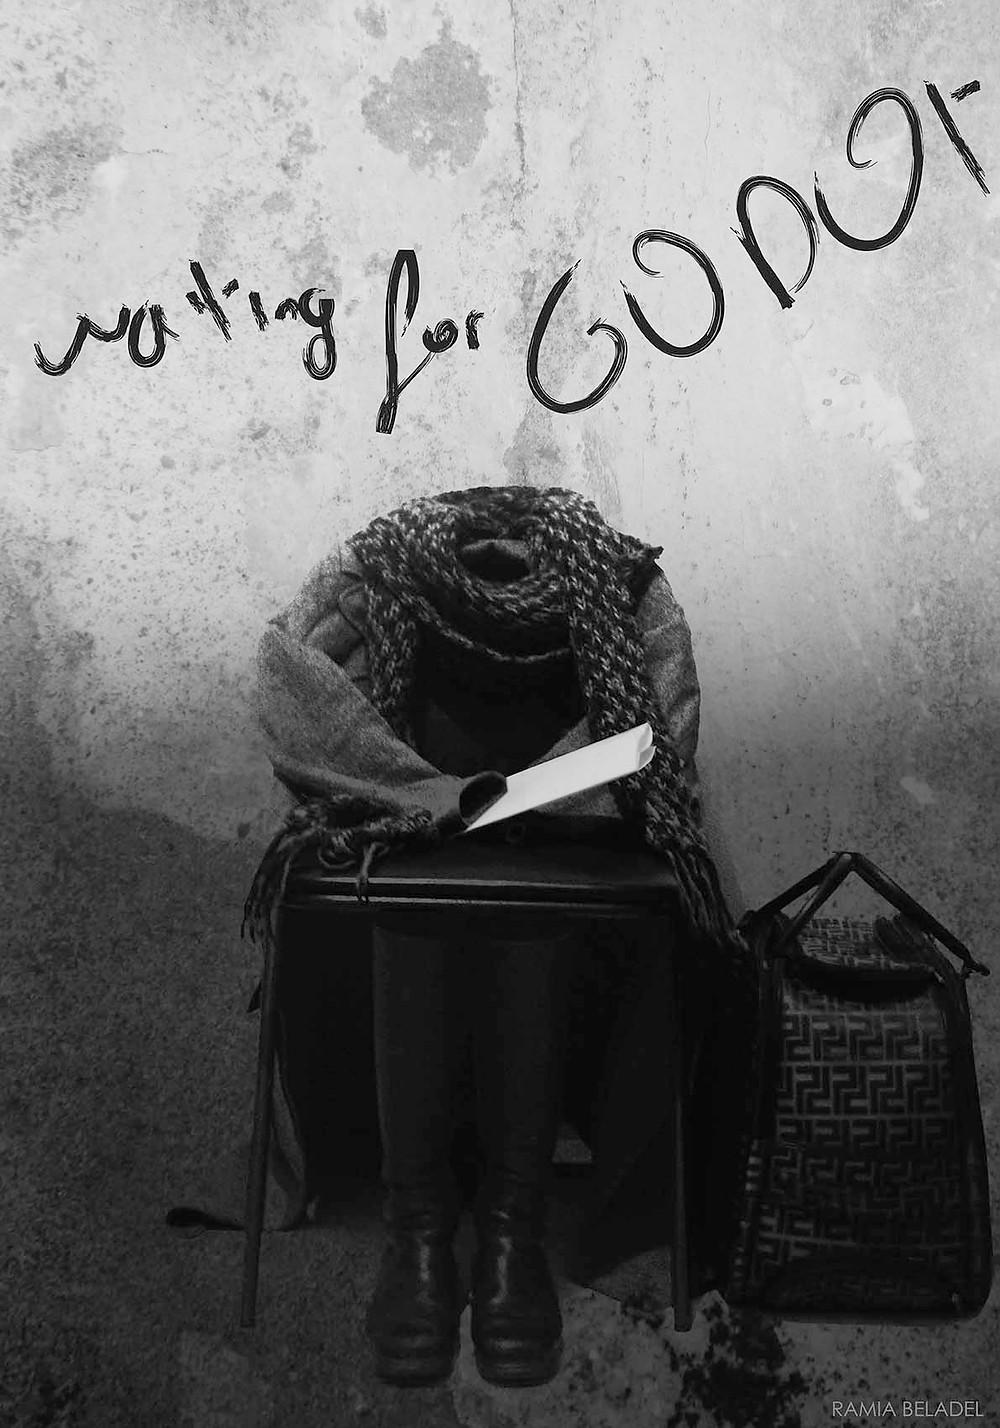 Waiting for Godot#Thetraveler, 2012 Photography